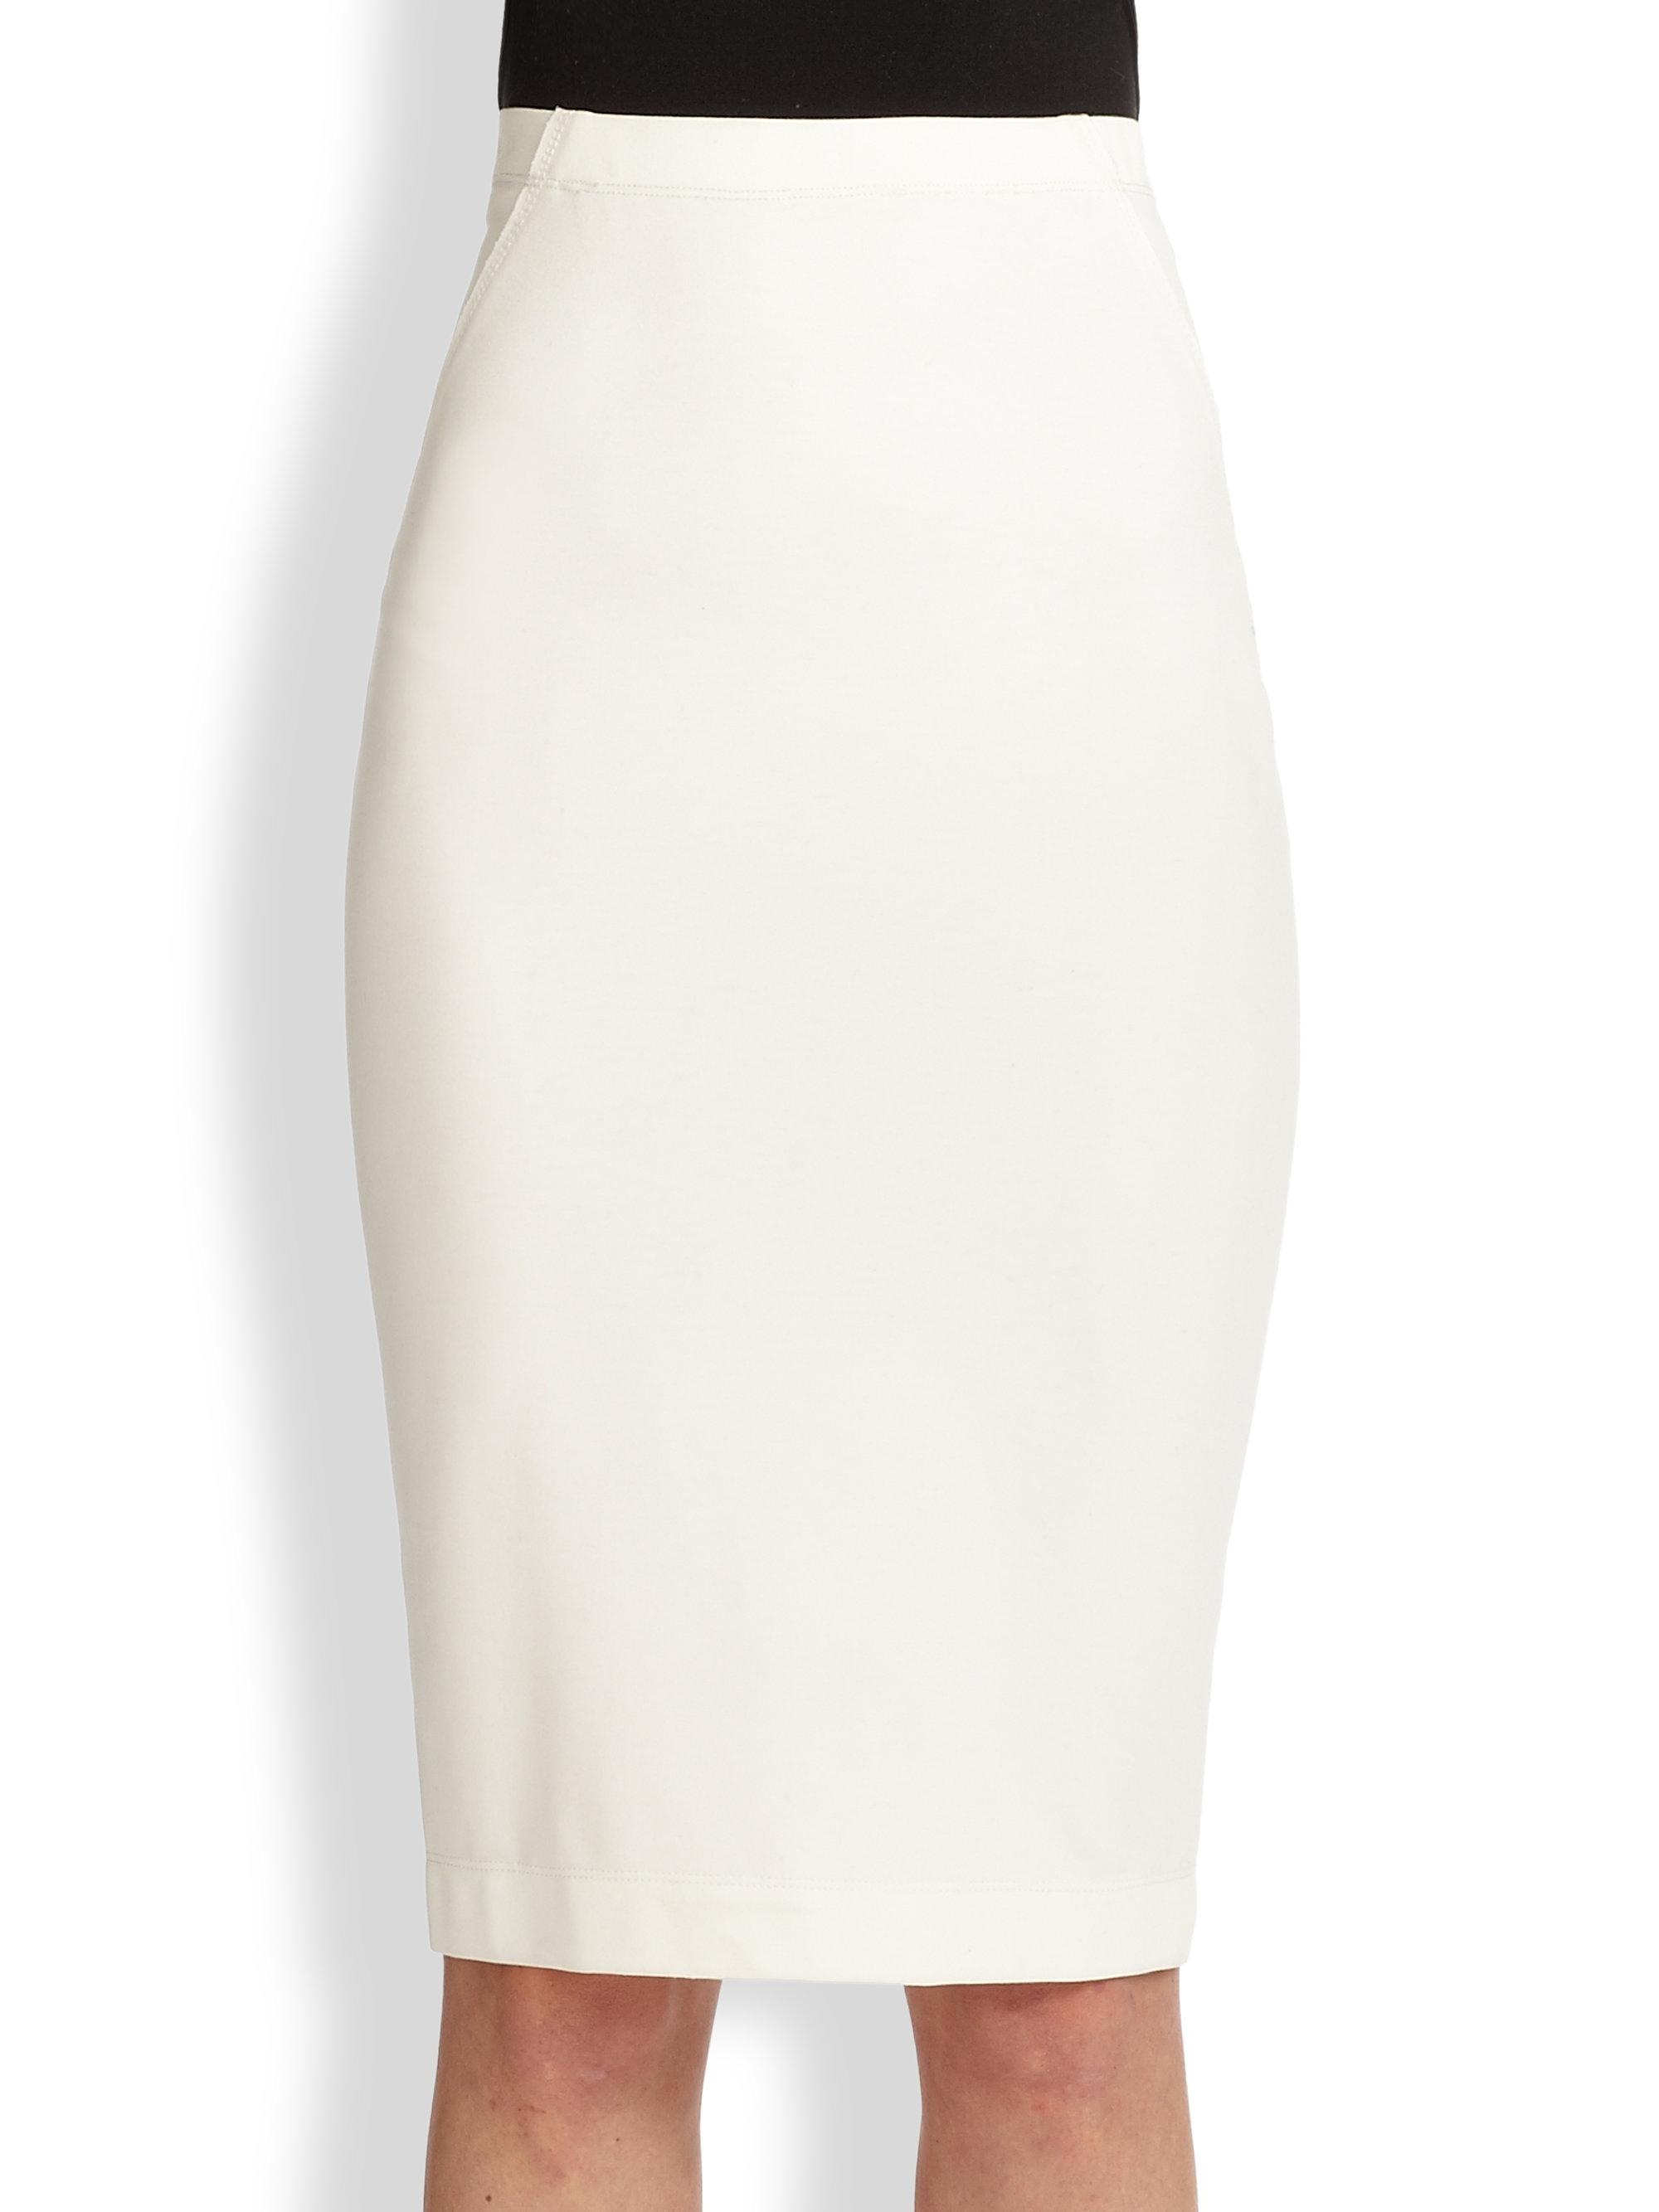 donna karan pull on pencil skirt in white lyst